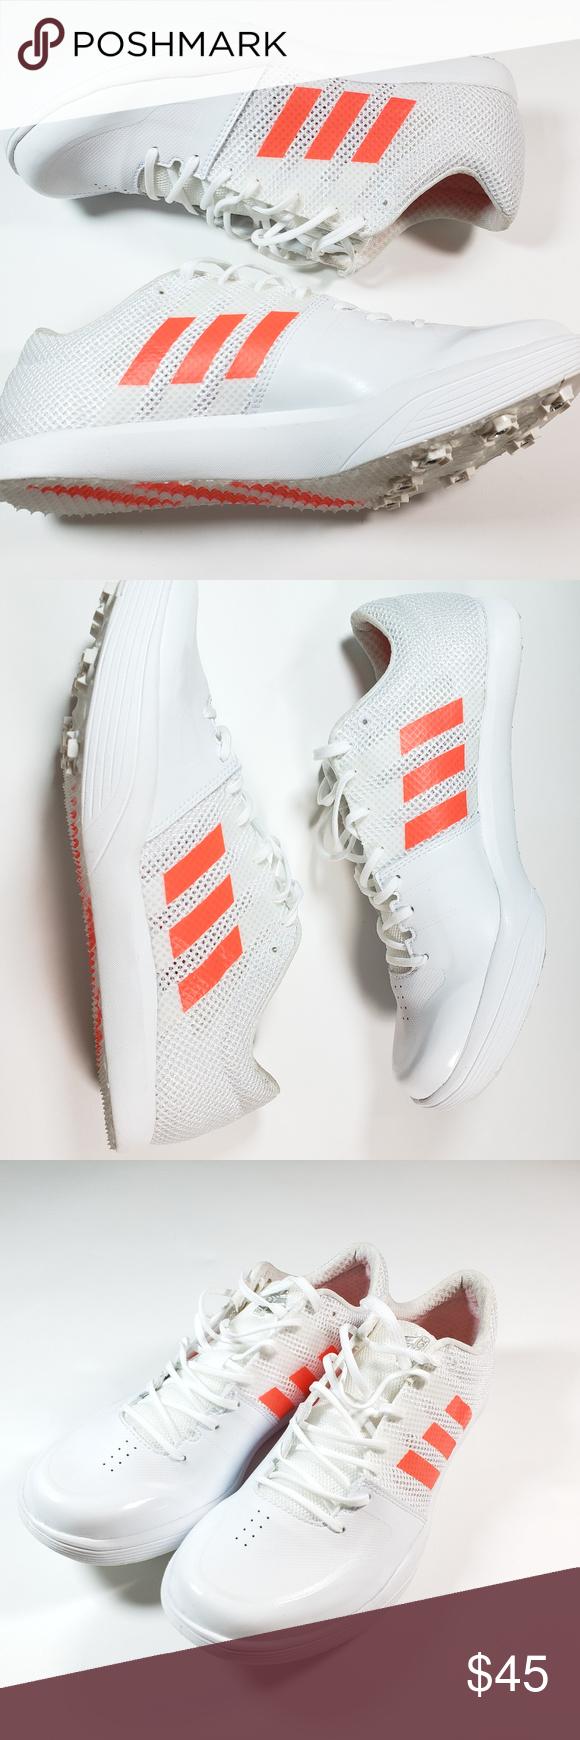 Adidas Adizero Men's Spikes White Orange Long Jump | Track and ...